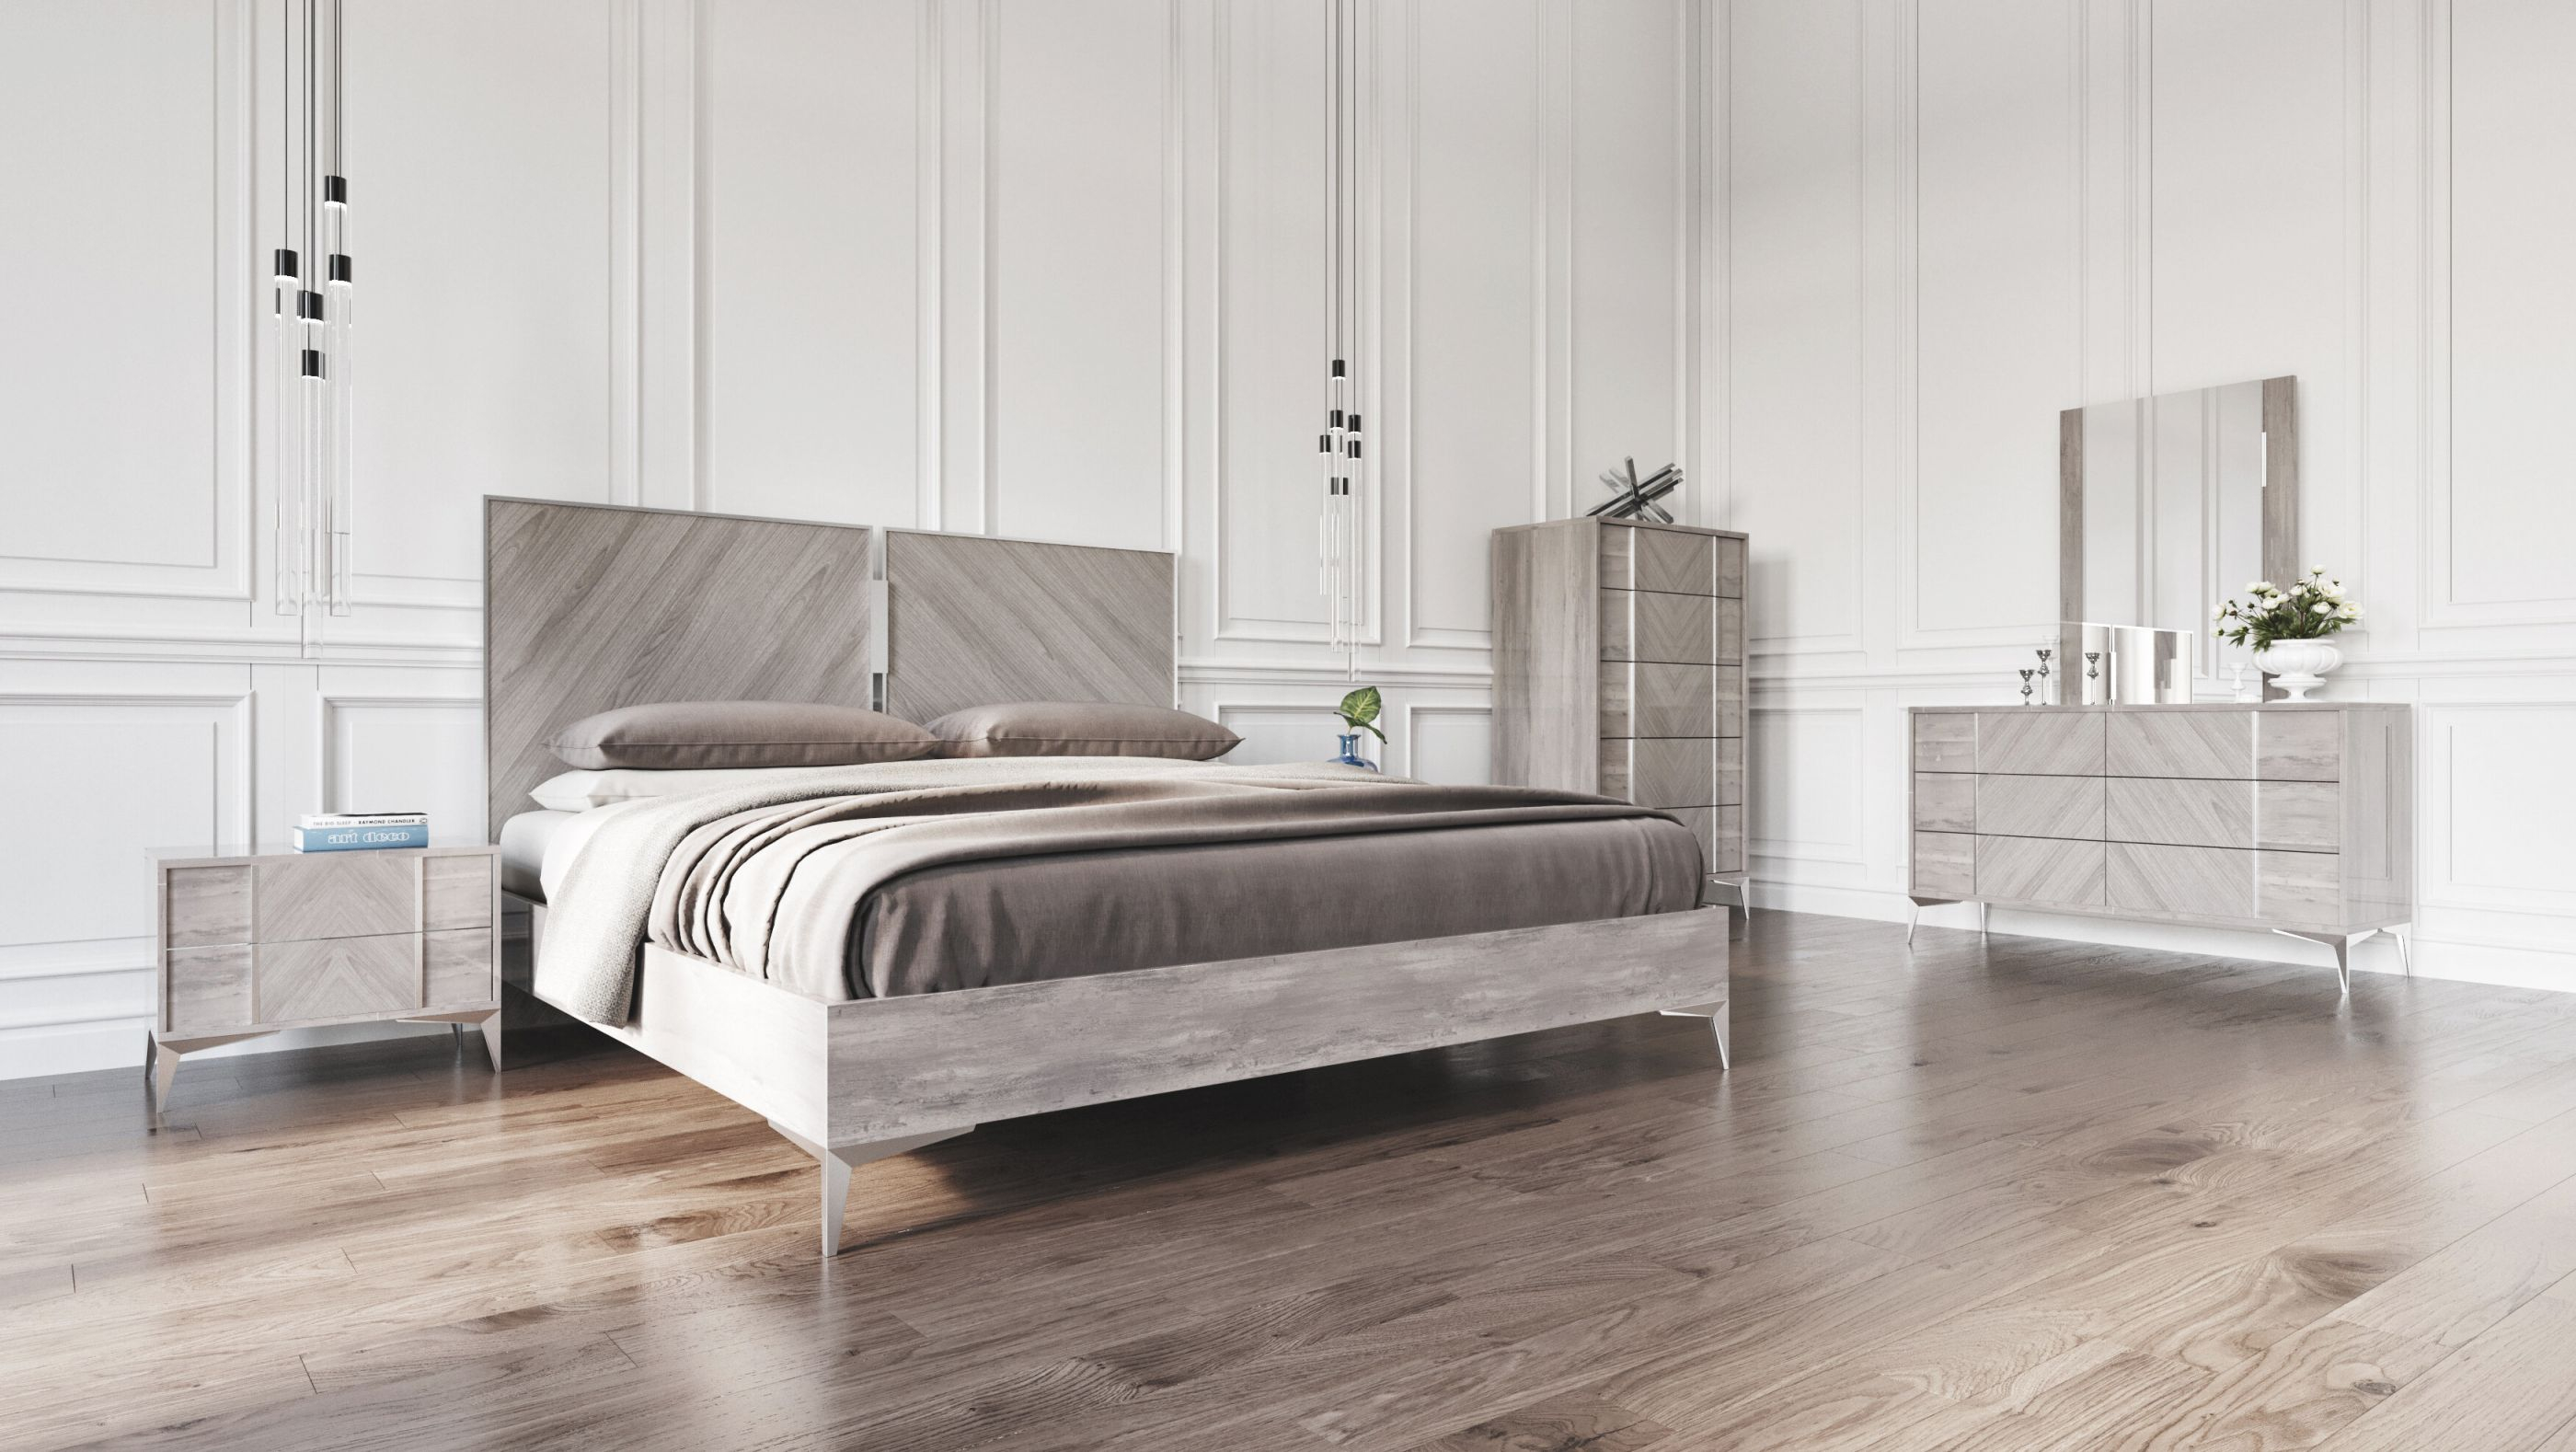 Labombard Modern 5 Piece Platform Bedroom Set pertaining to Luxury Bedroom Set Modern